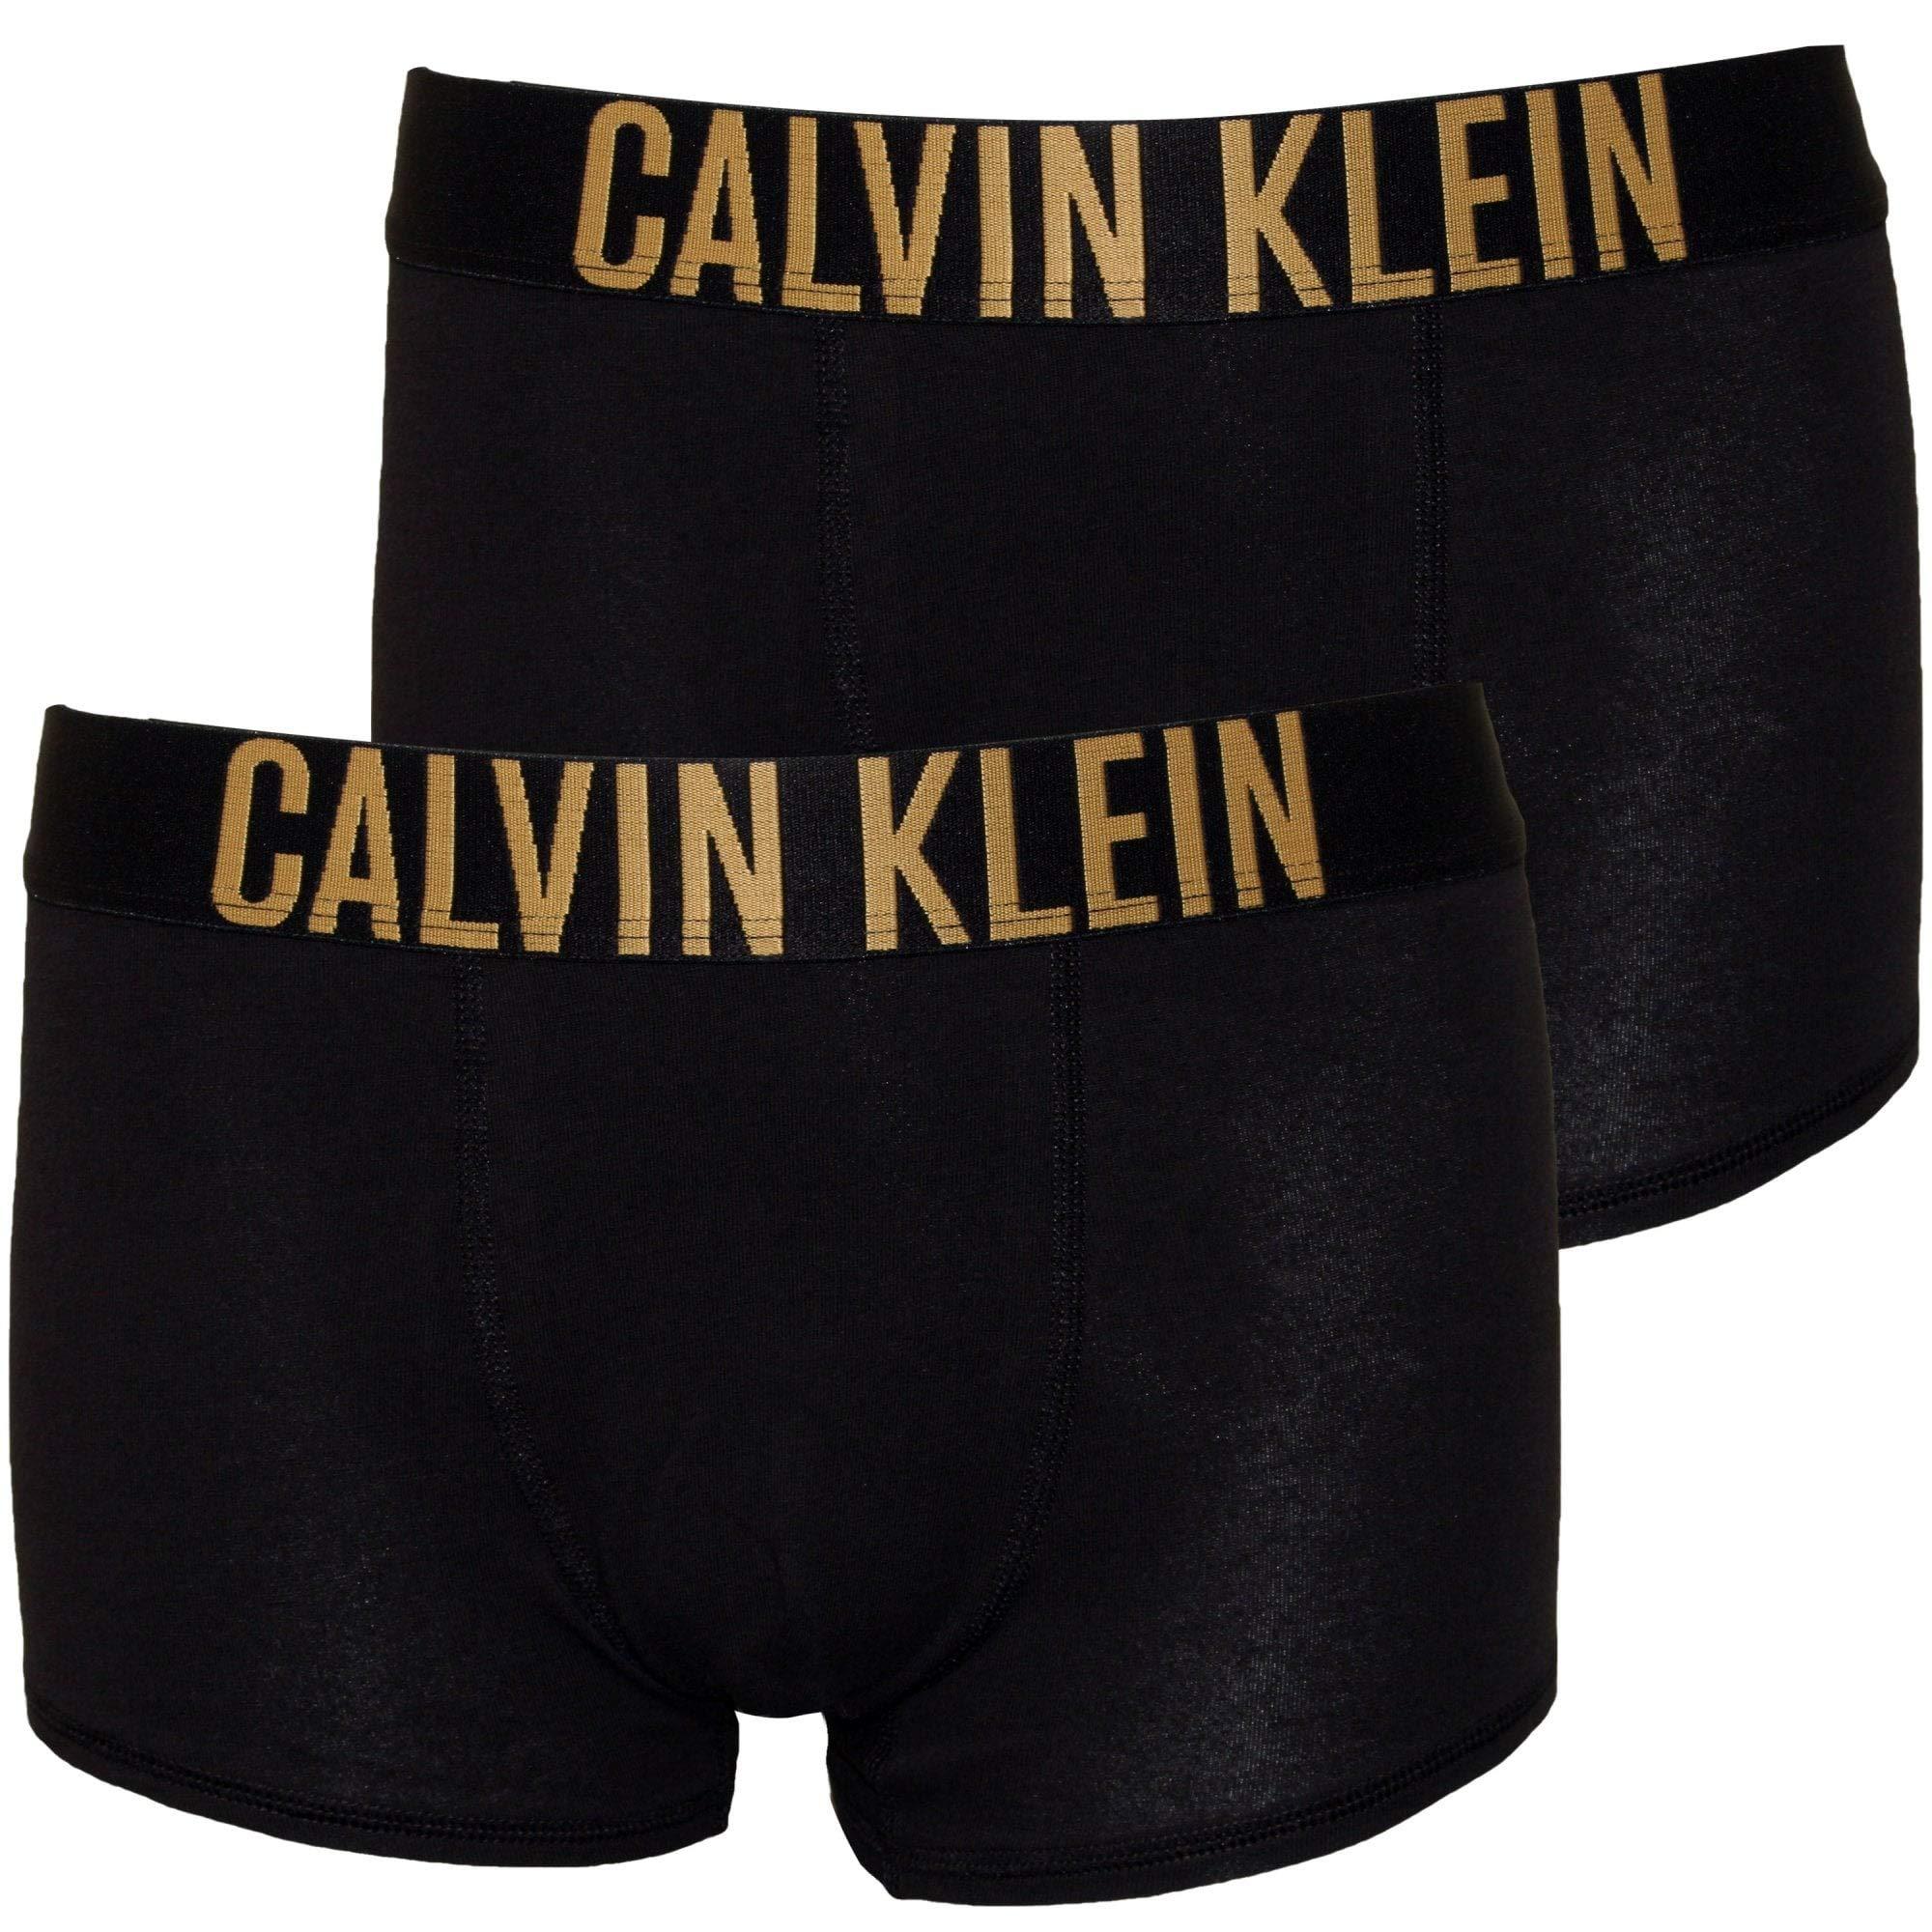 Calvin Klein Boy's 2-Pack Bold Logo Boys Boxer Trunks, Black/Gold Age 8-10 Black/Gold